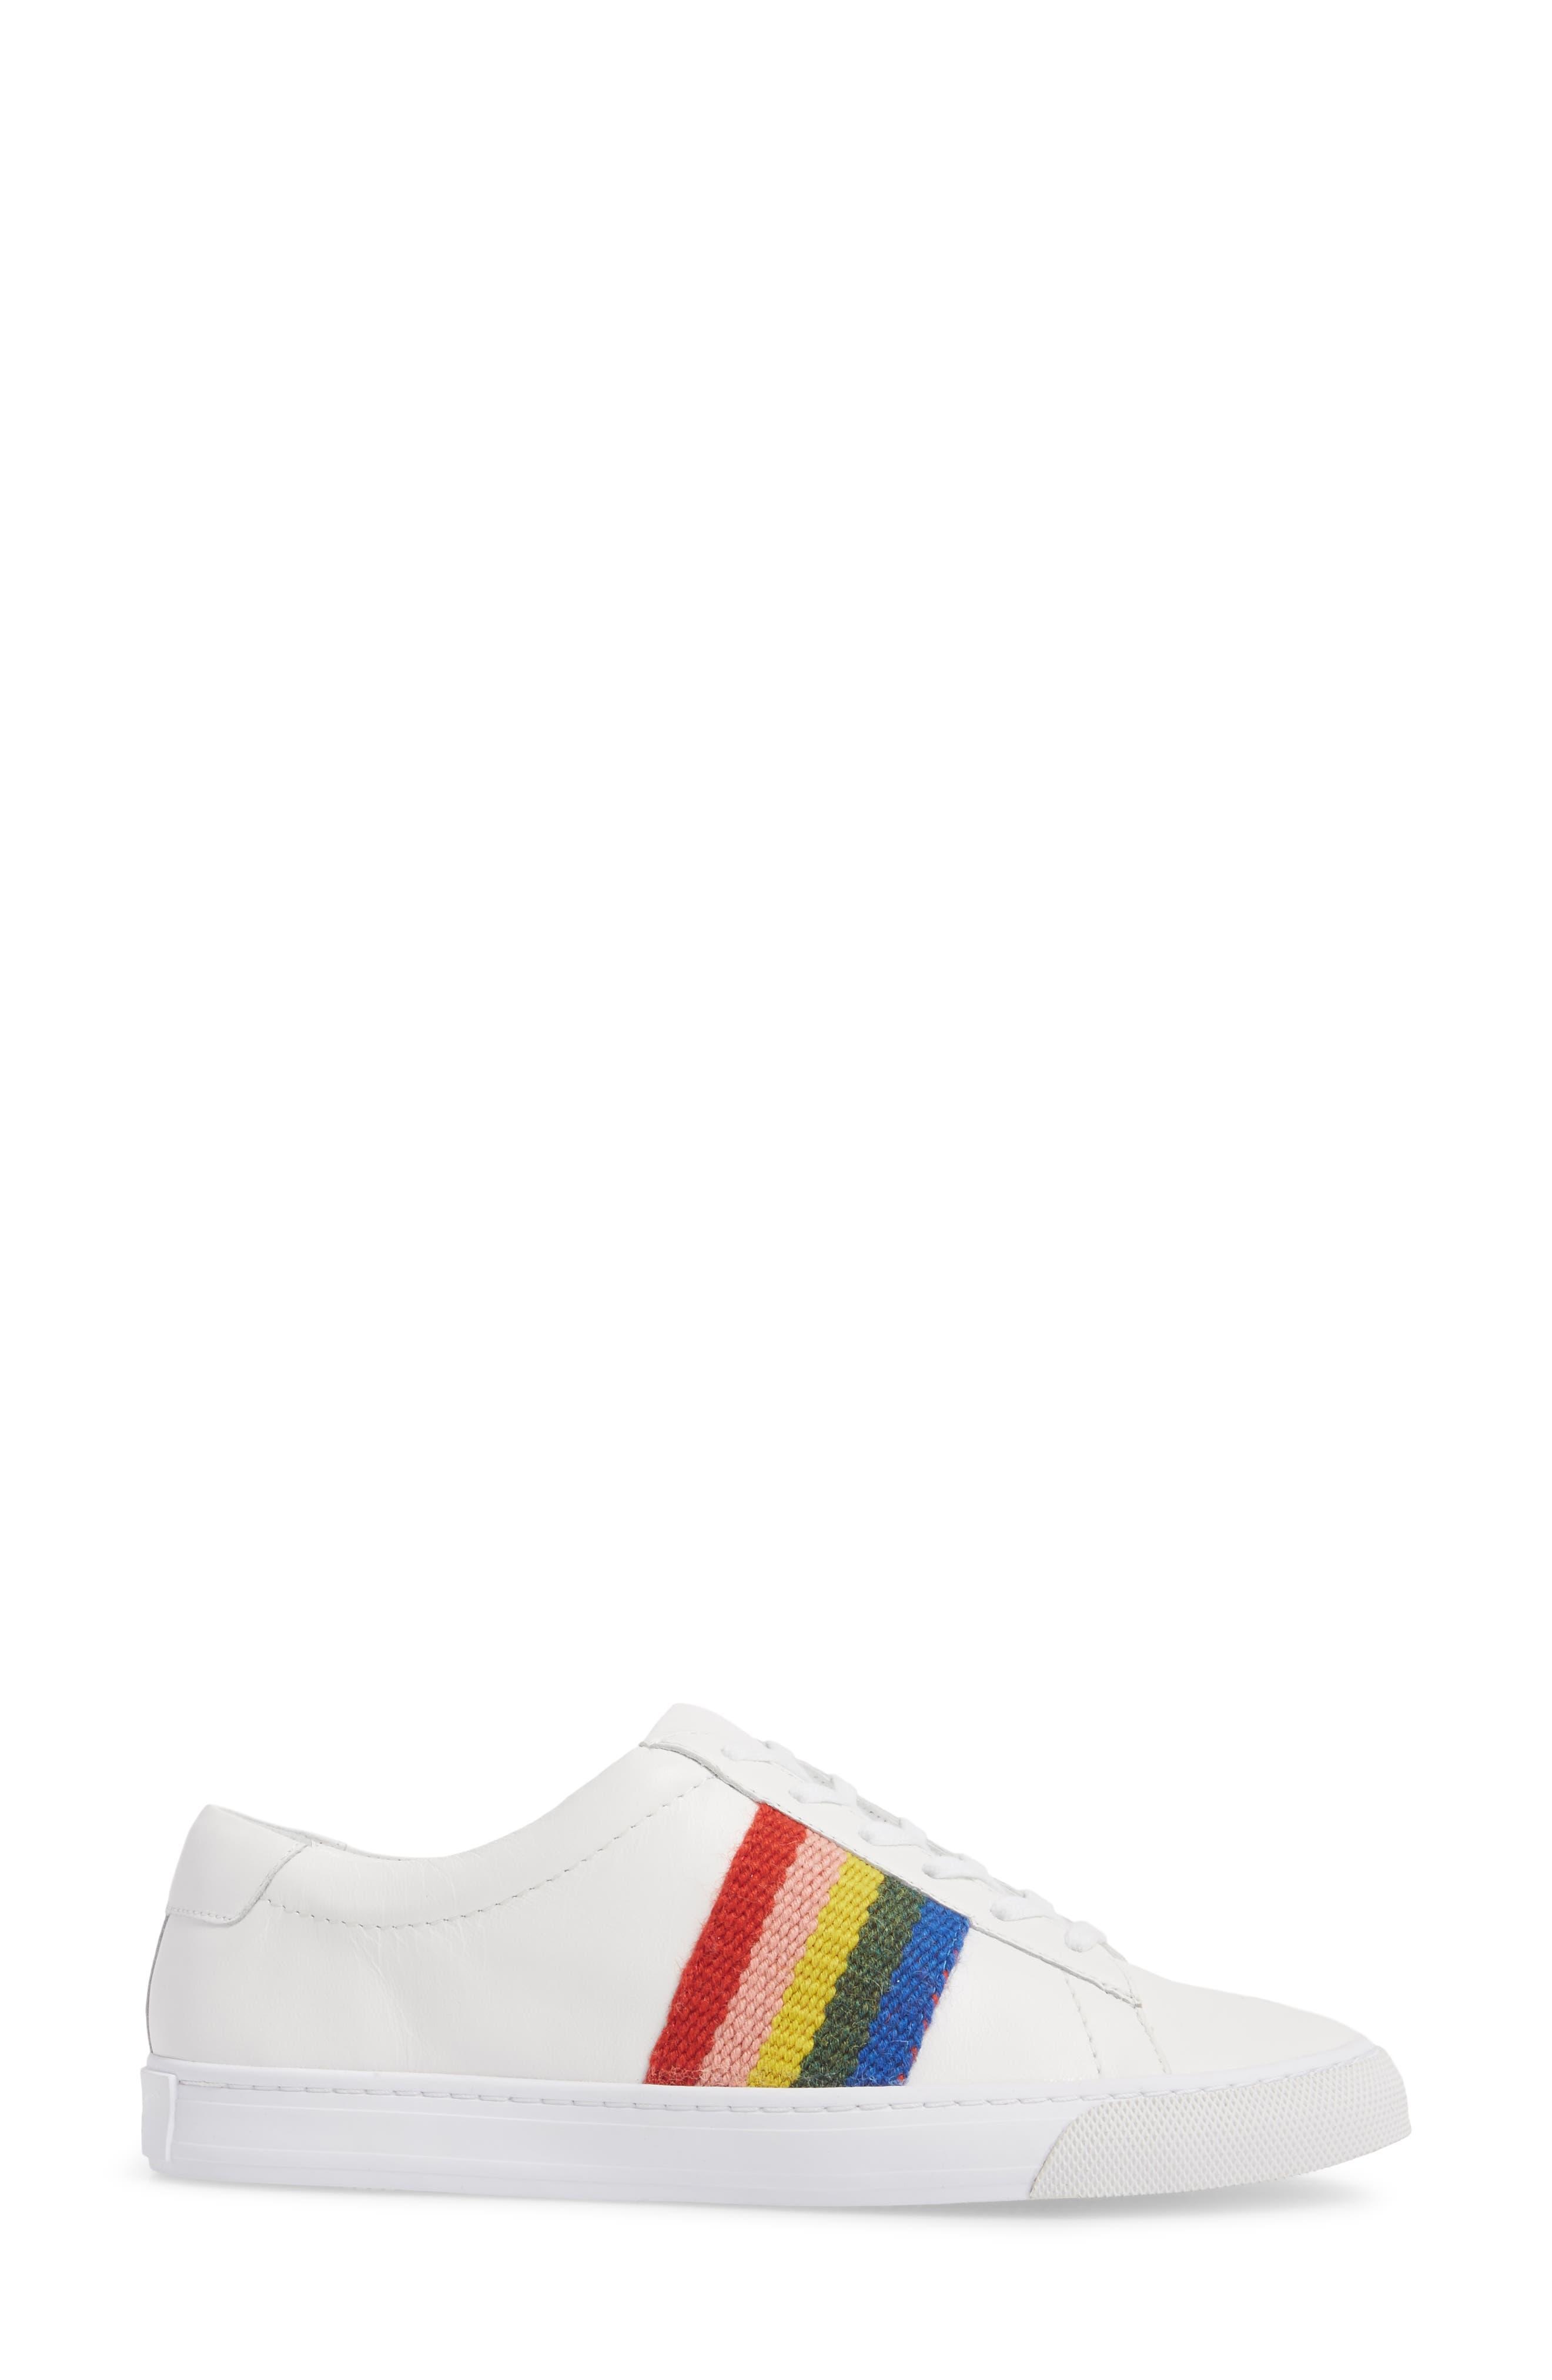 Logan Rainbow Sneaker,                             Alternate thumbnail 3, color,                             WHITE/ RAINBOW